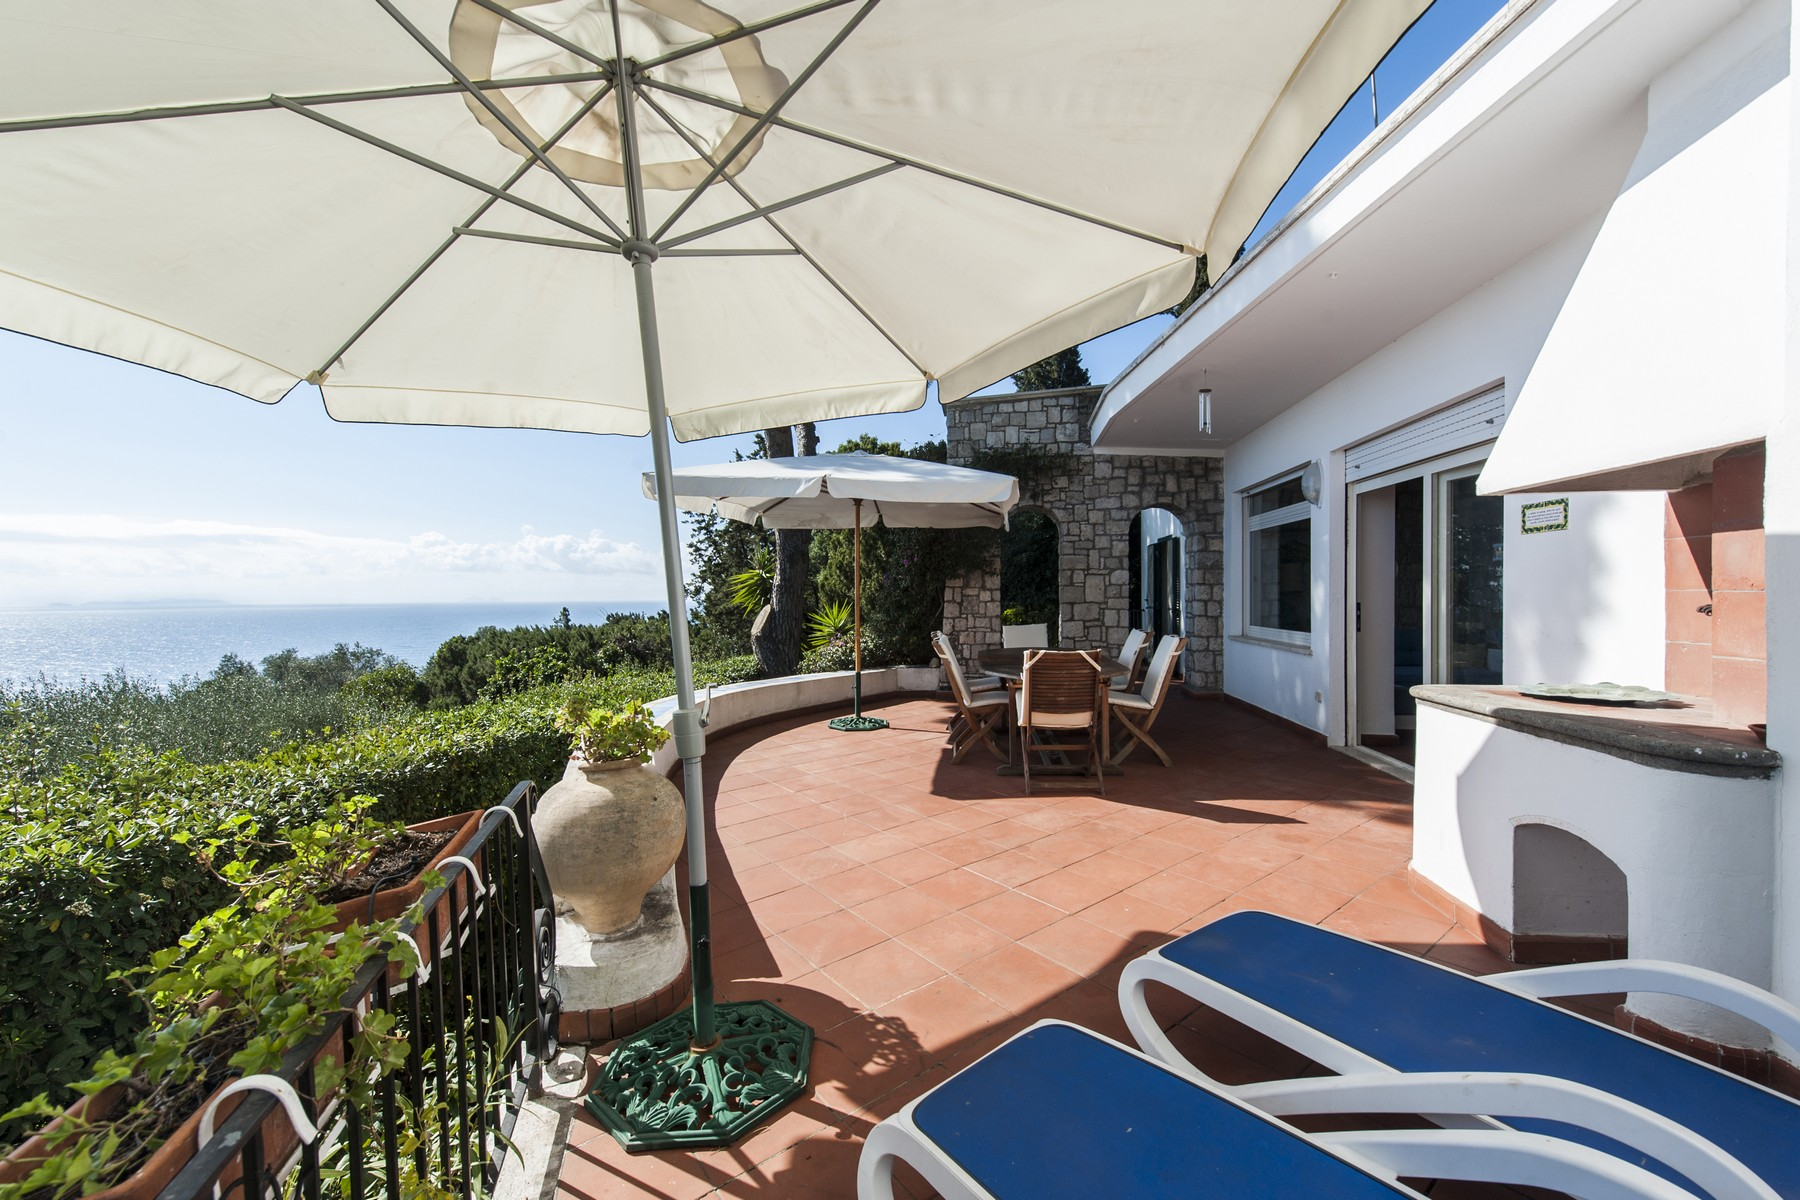 Maison unifamiliale pour l Vente à Charming villa overlooking the sea in the Circeo National Park Via del Faro San Felice Circeo, Latina 04017 Italie